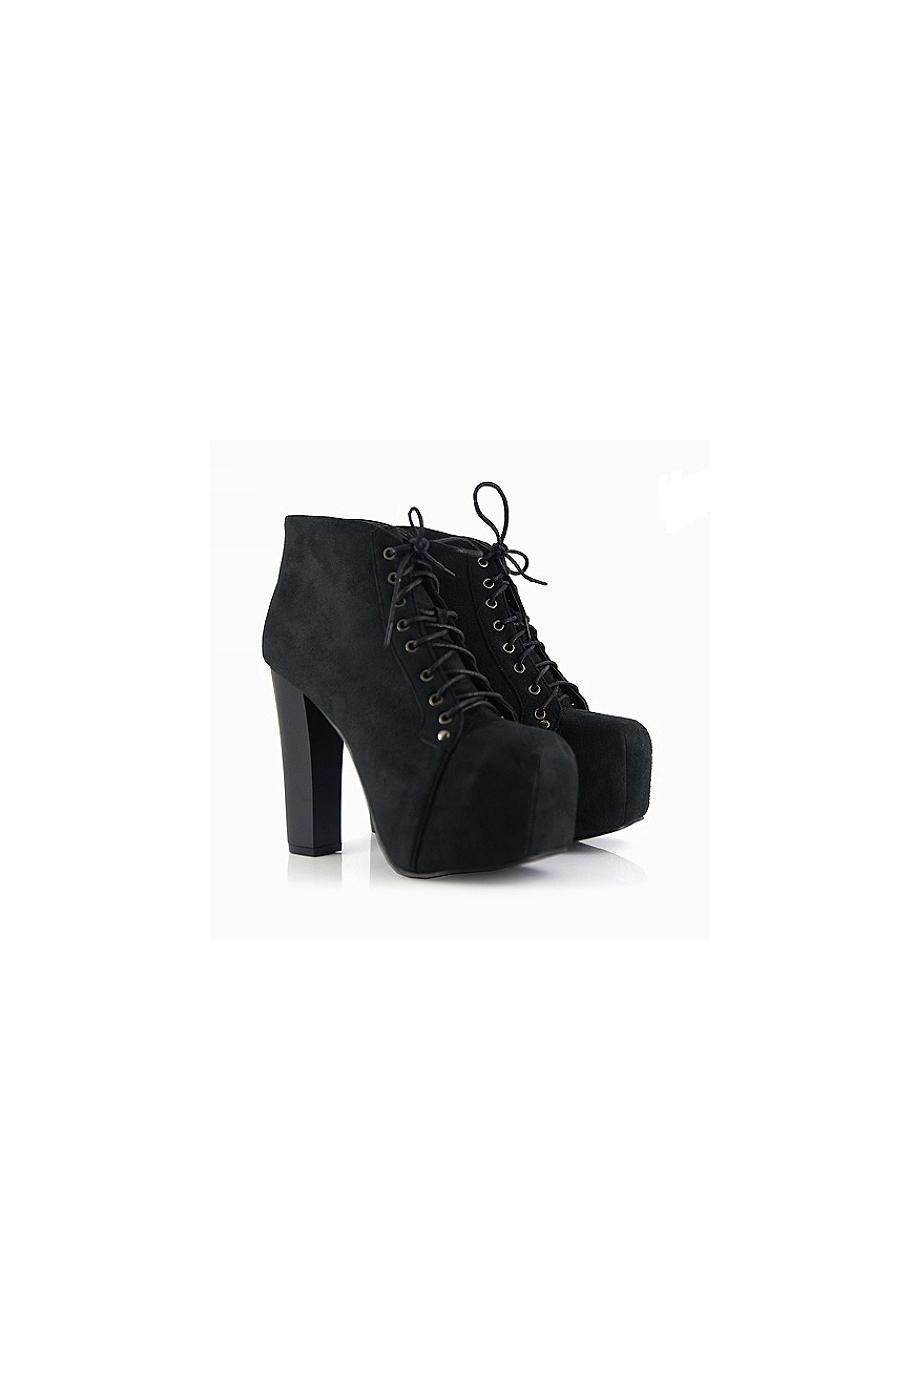 ZENA Black Platform Ankle Boots Shop Jeffrey Campbell Lita Inspired Platform Boots   Online Store Black Platform Ankle Boots   Runway Shoes - Jessica Buurman [125] - $99.00 : JESSICABUURMAN.COM